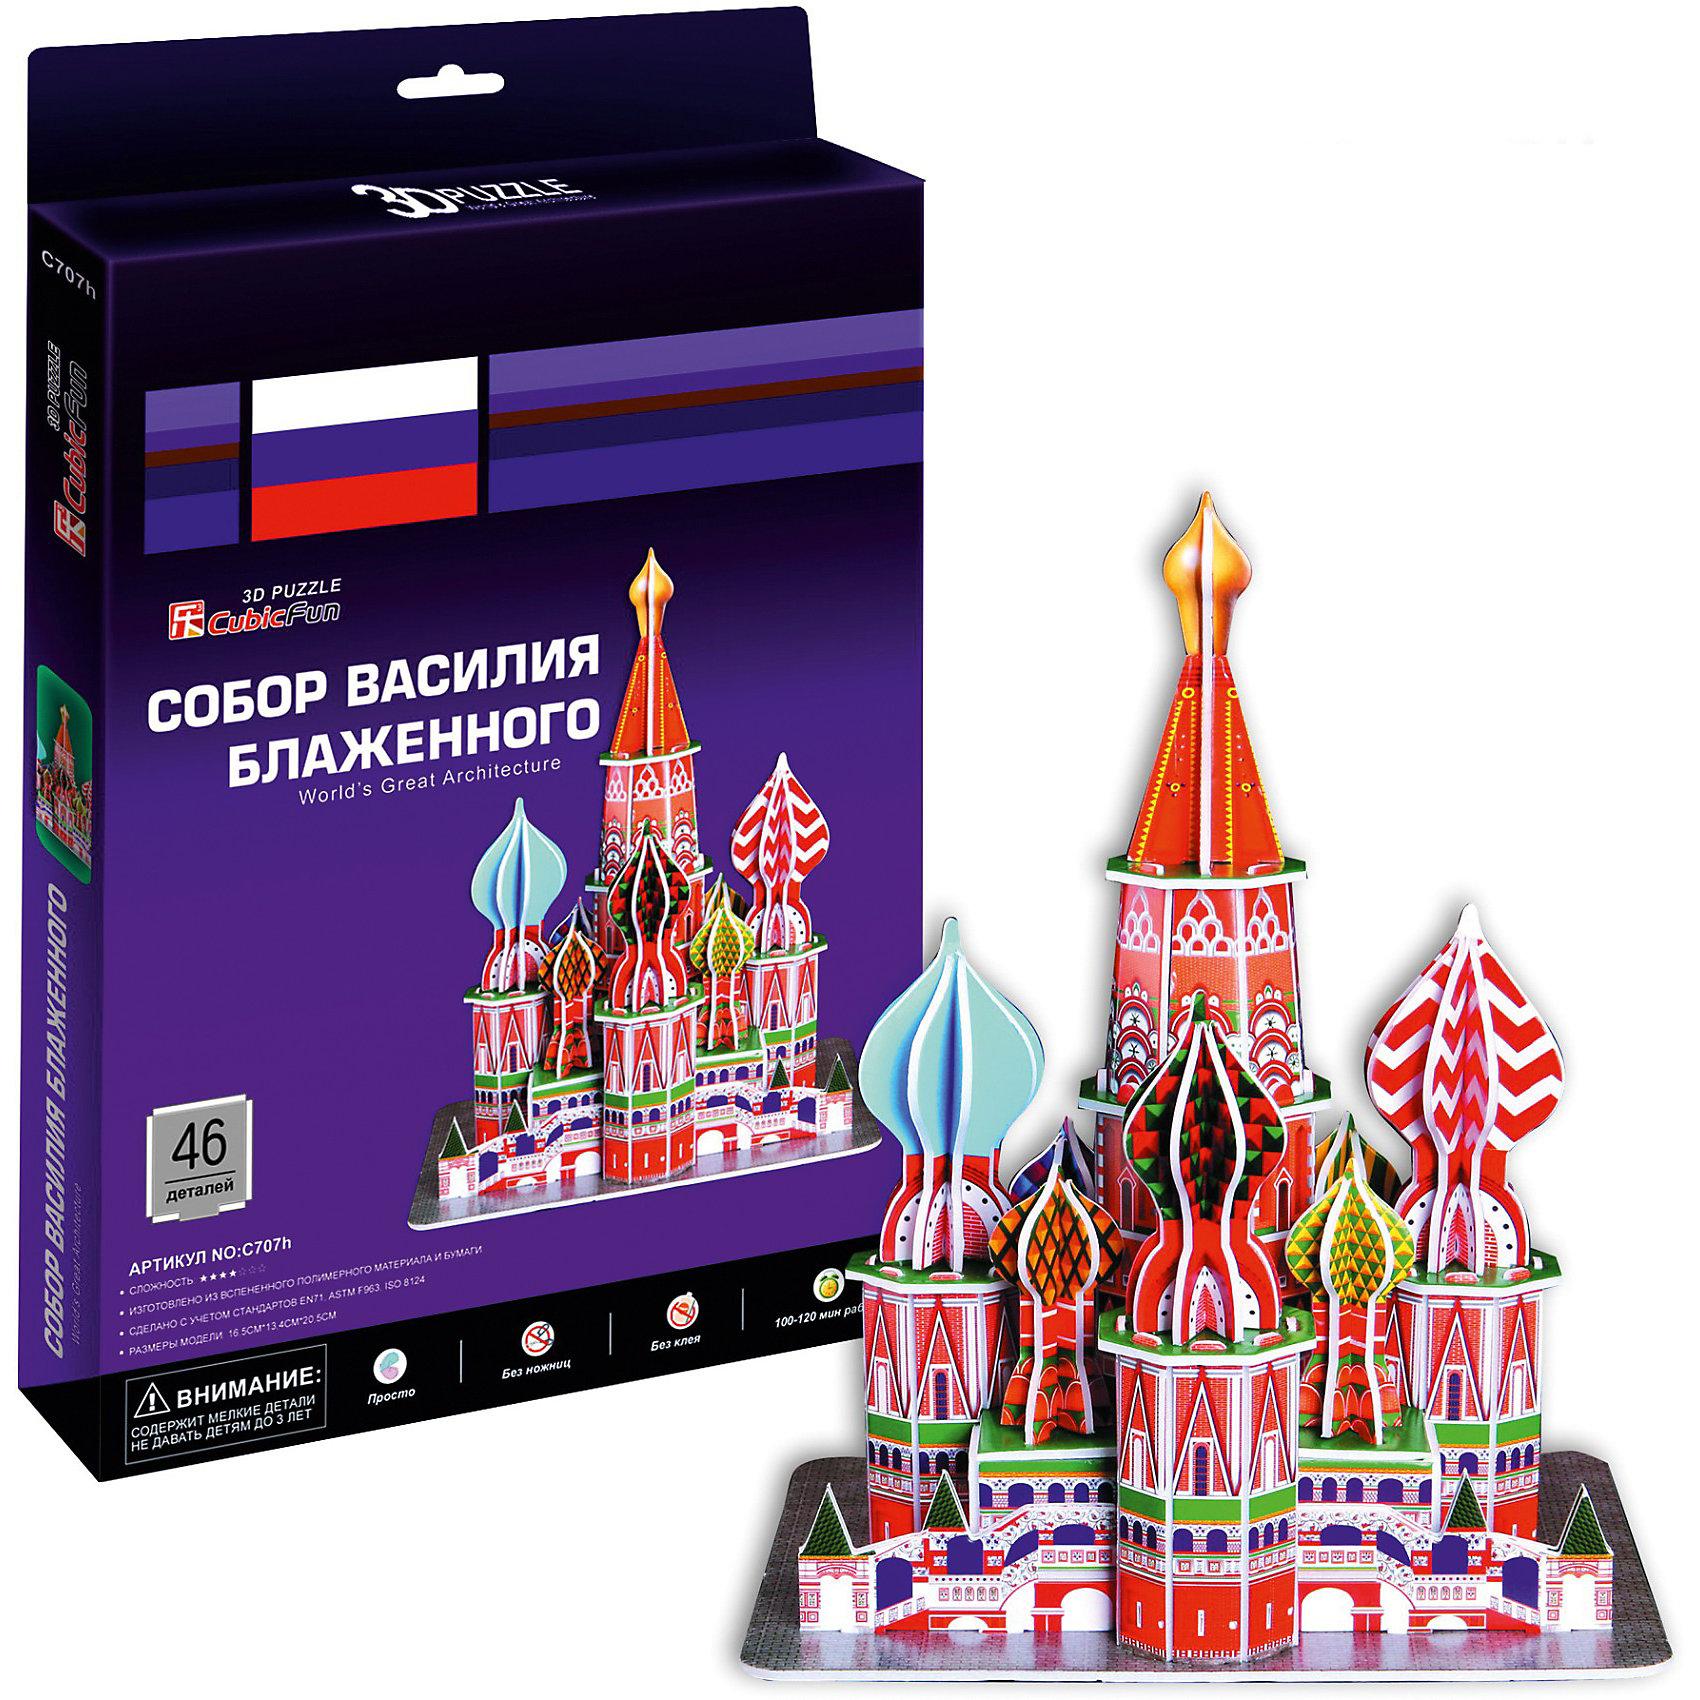 CubicFun Пазл 3D Собор Василия Блаженного (Москва), 46 деталей, CubicFun cubicfun 3d пазл эйфелева башня 2 франция cubicfun 33 детали